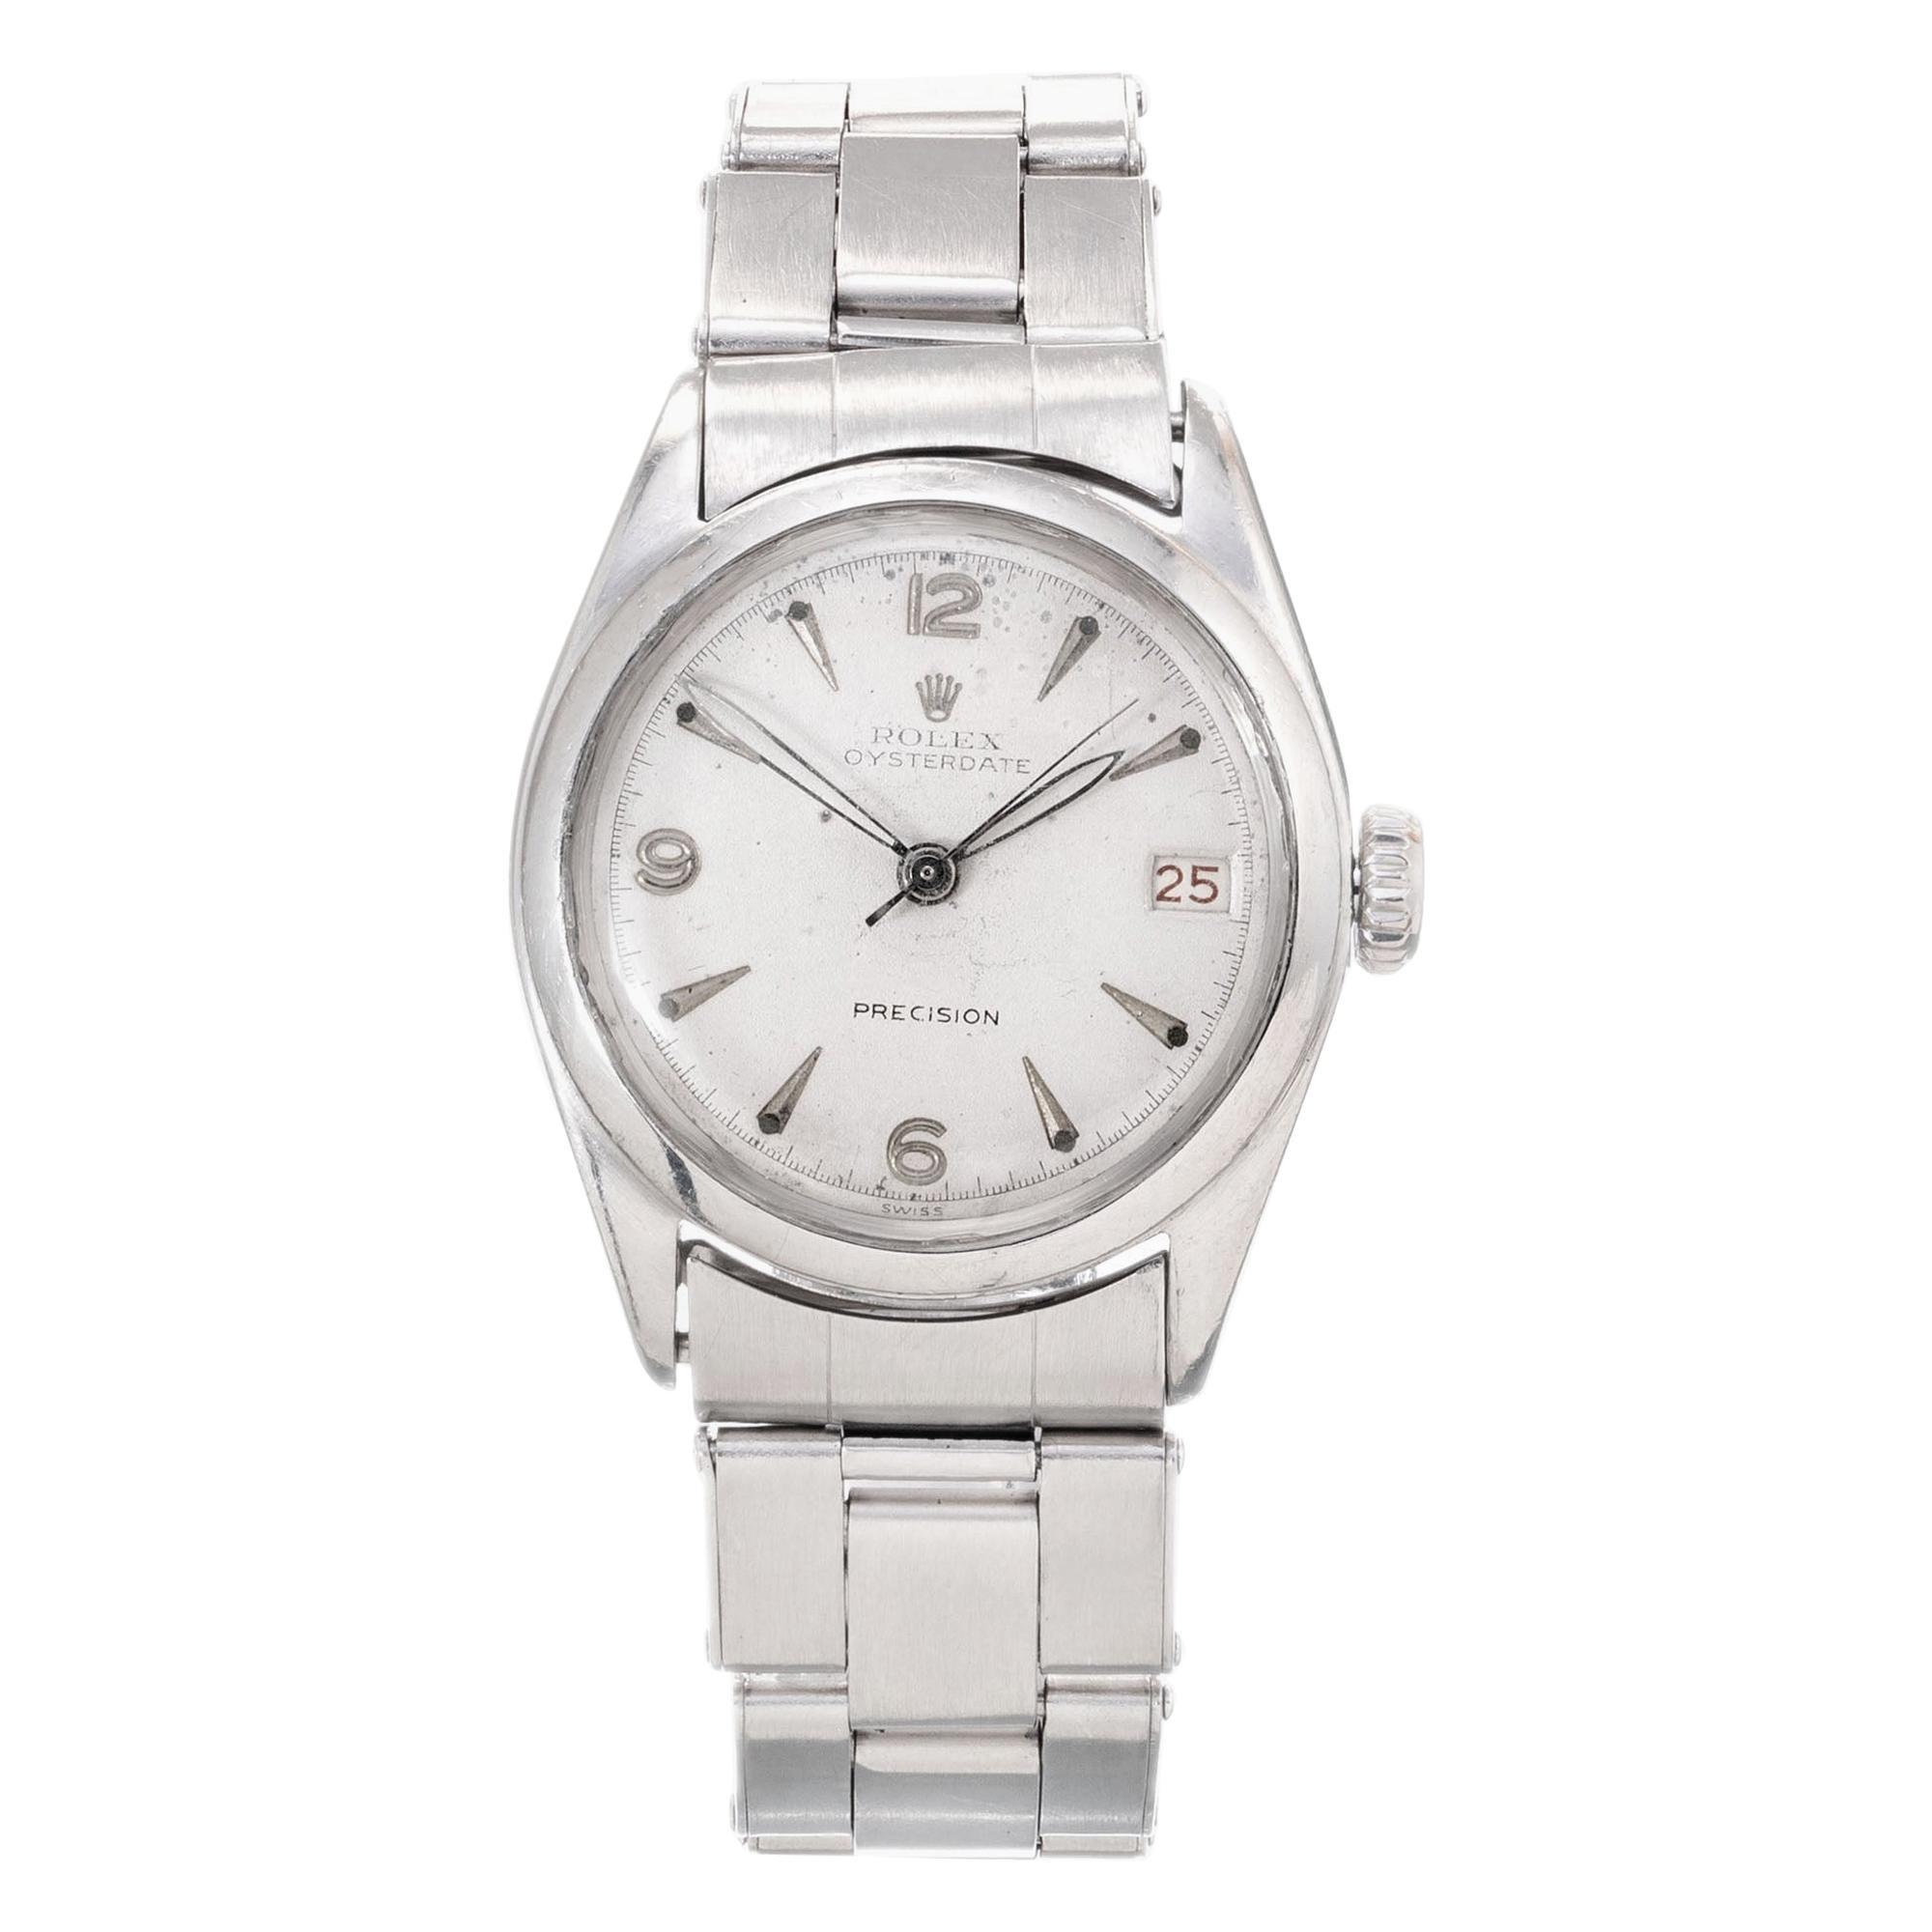 Rolex Oyster Date Precision Stainless Steel Men's Wristwatch Ref 6066